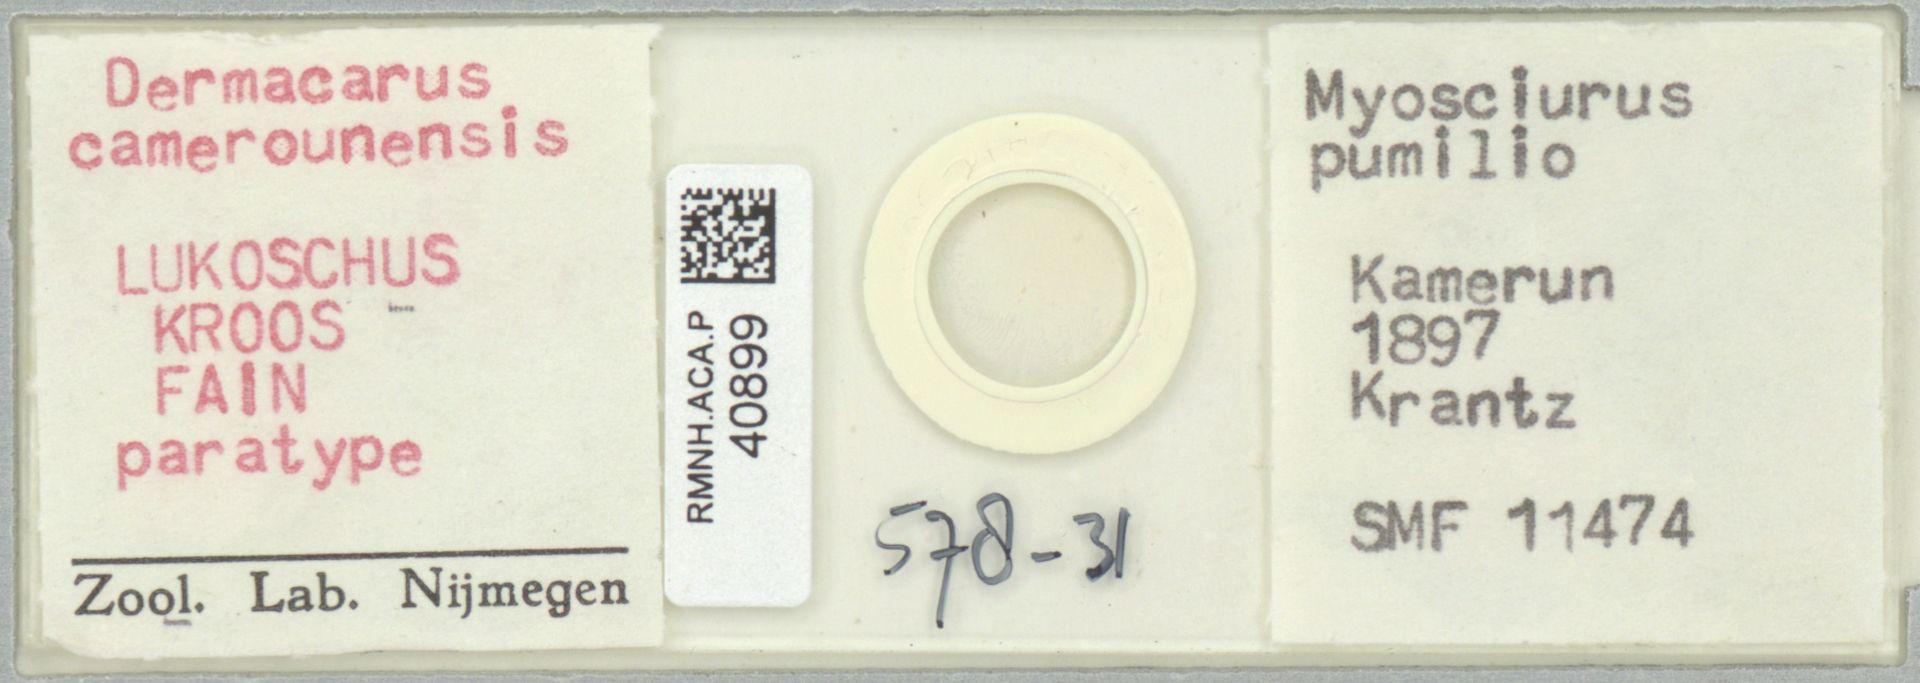 RMNH.ACA.P.40899 | Dermacarus camerounensis LUKOSCHUS KROOS FAIN